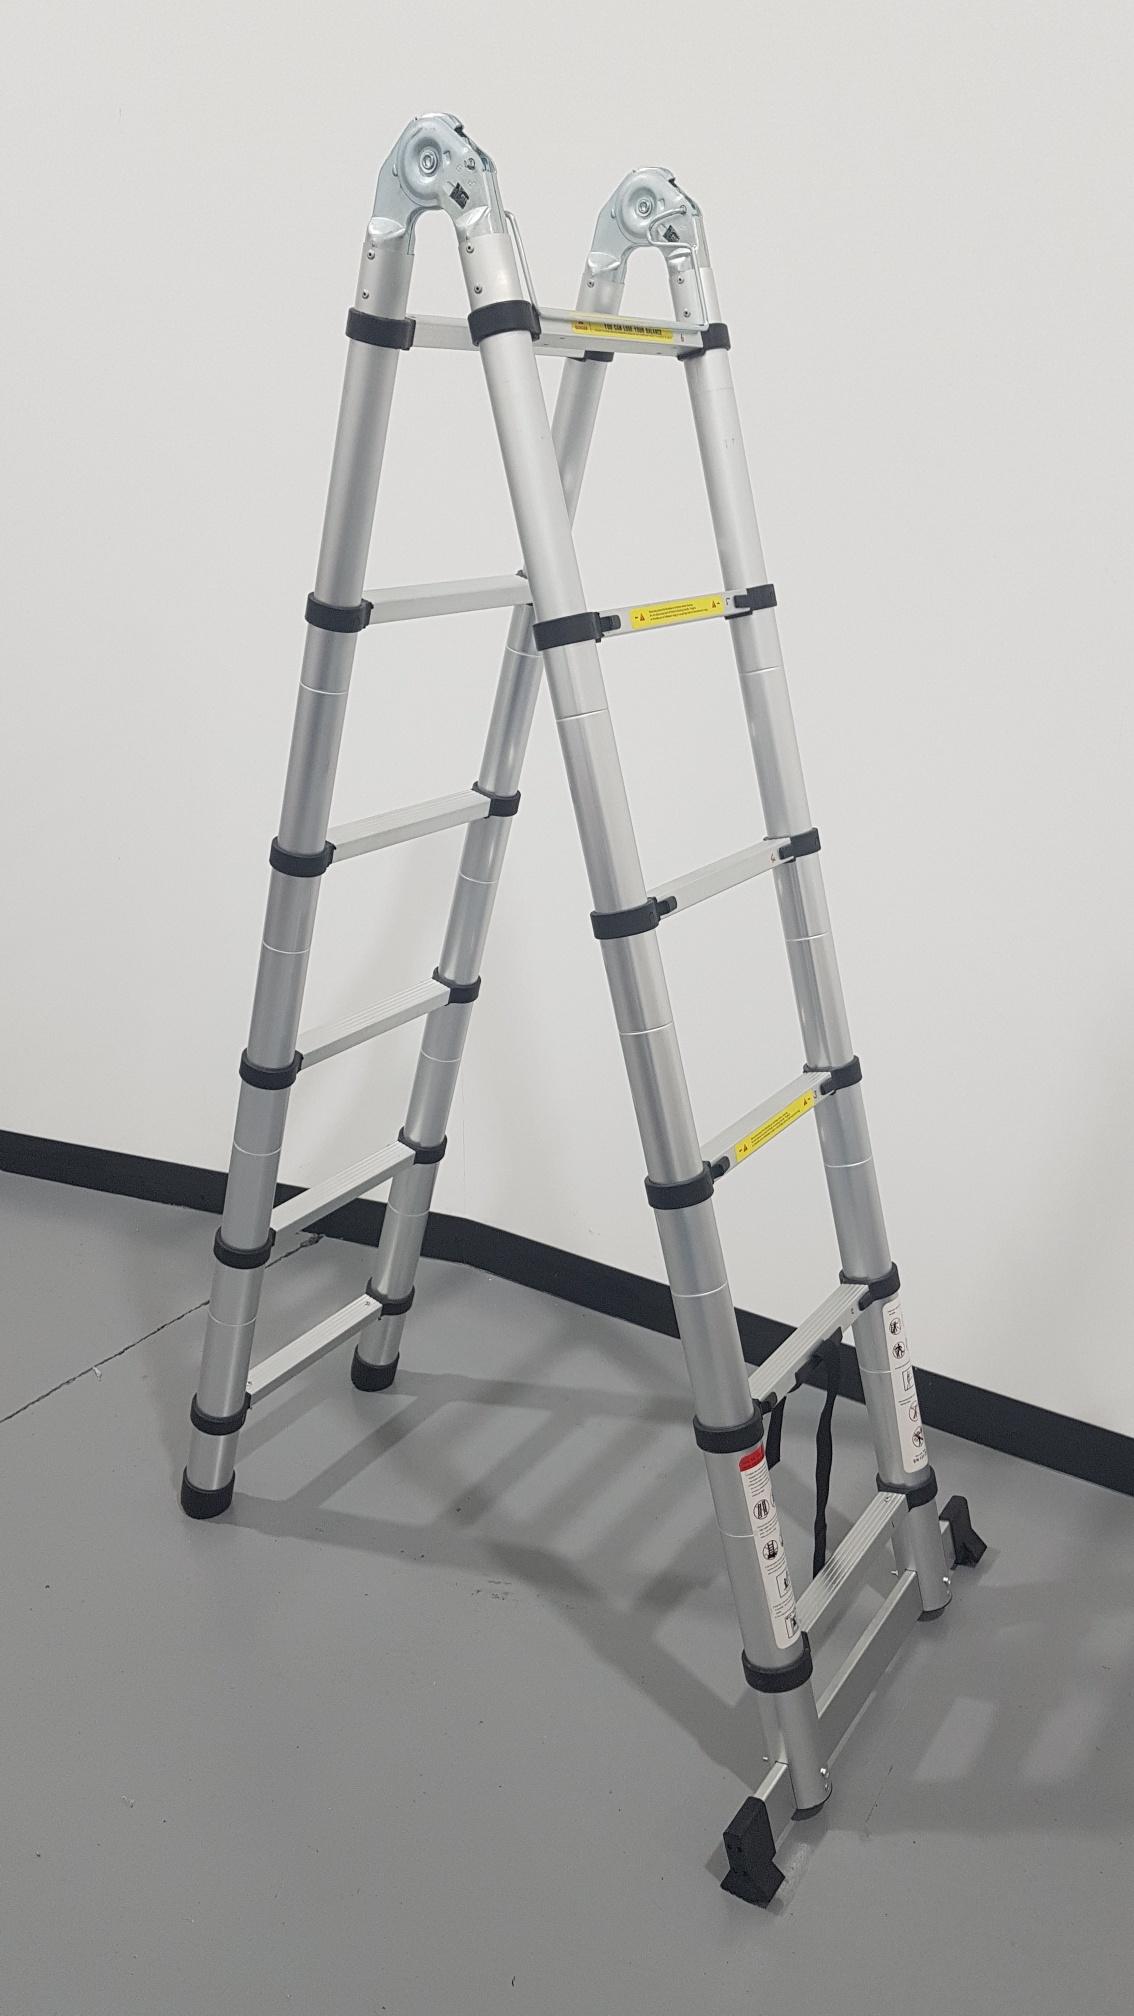 single hinge-joint ladder